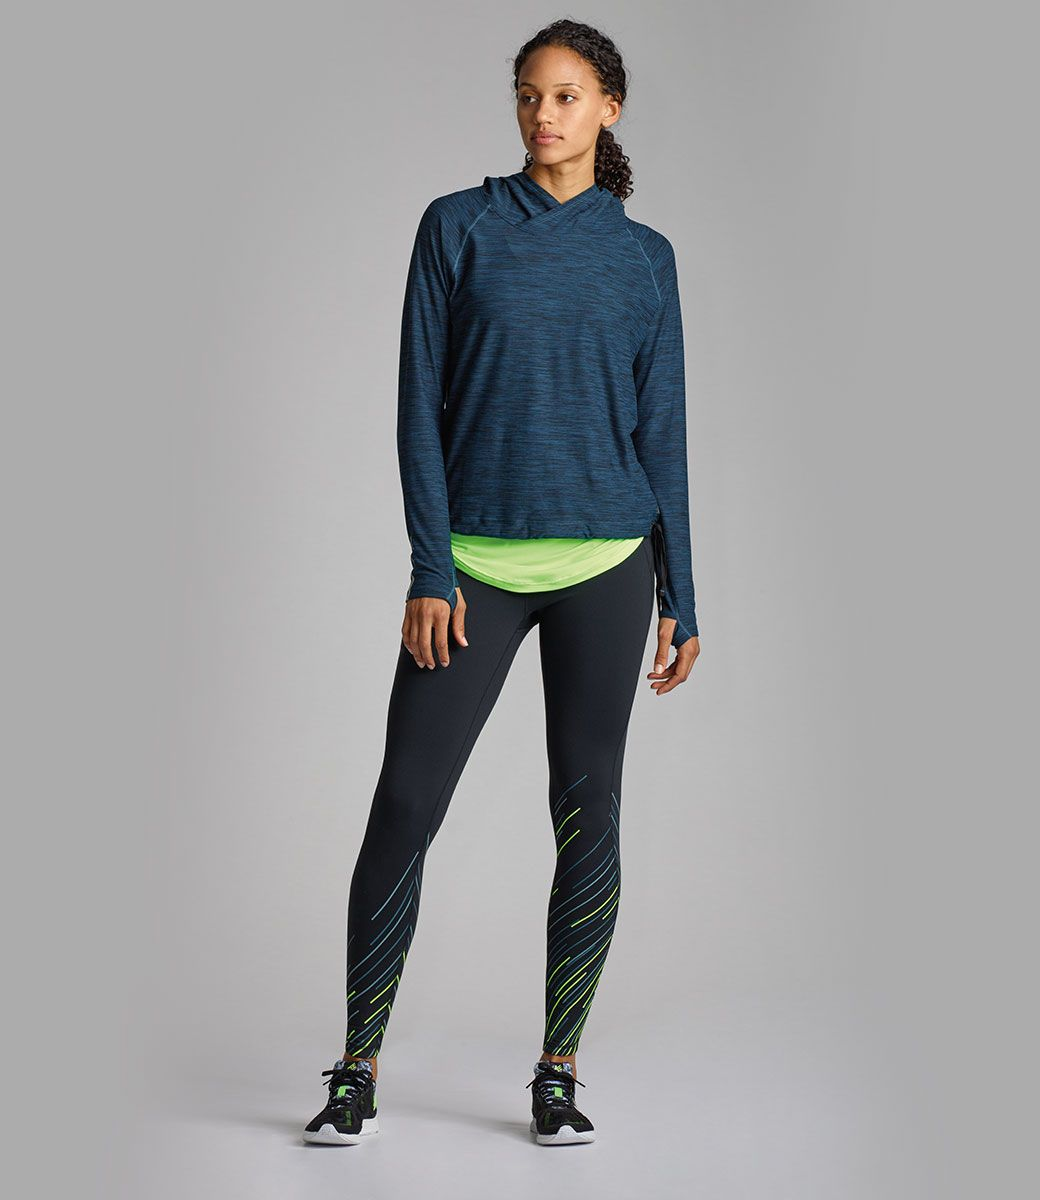 New Balance US Womens February Key Look WX77,